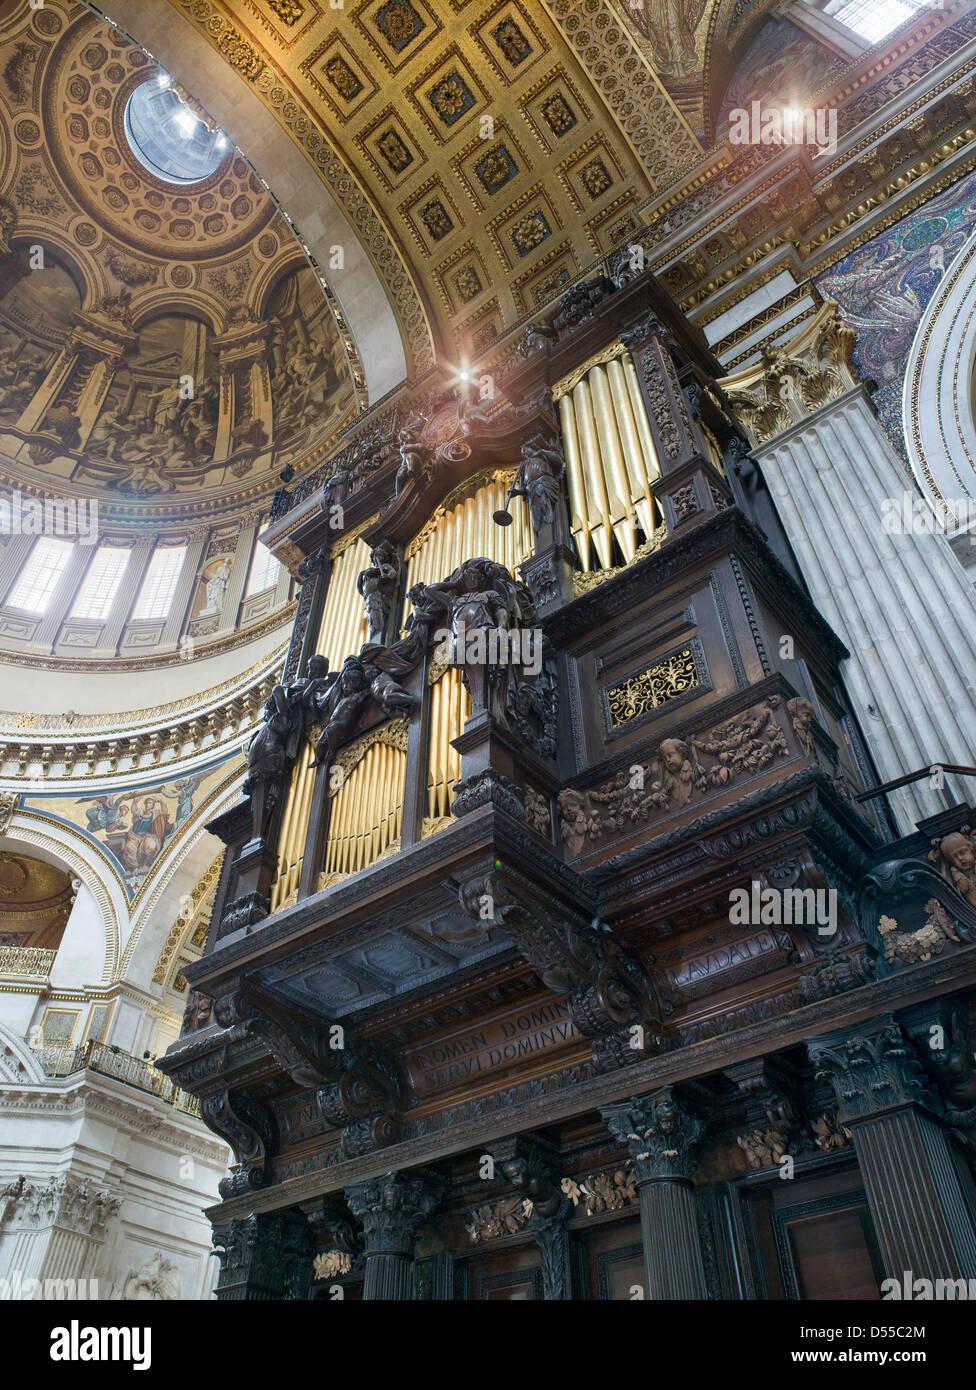 Órgano de la Catedral de St Paul's caso Imagen De Stock